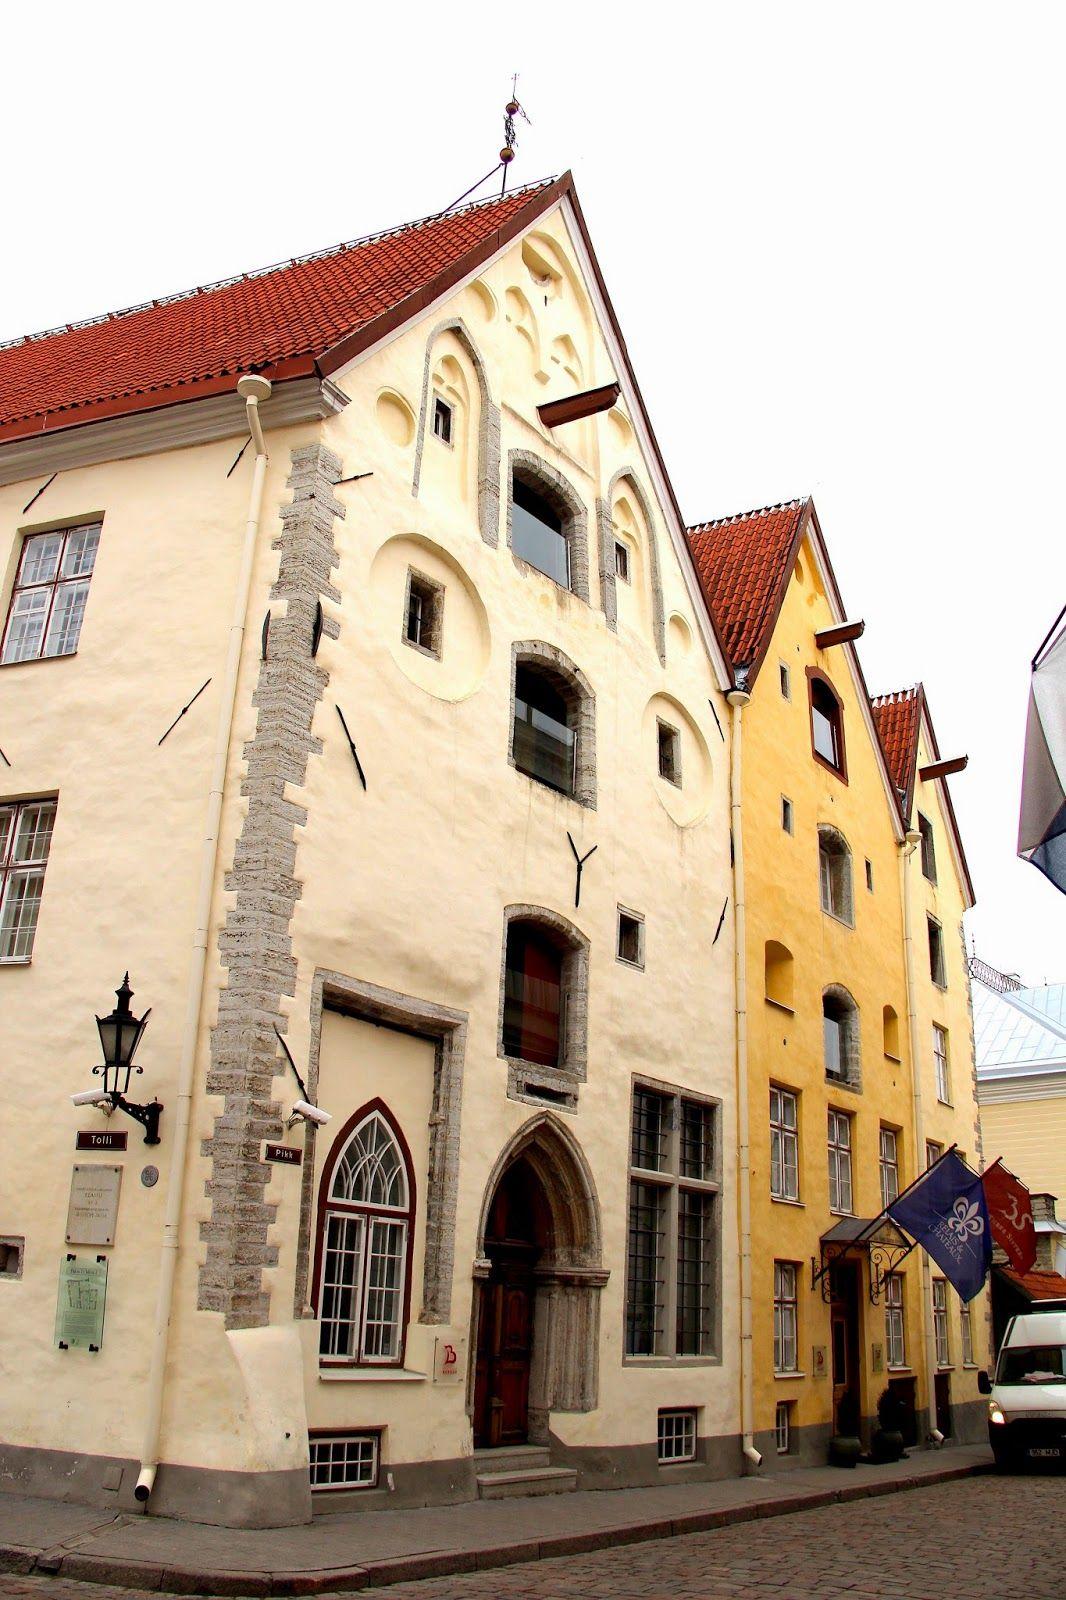 Three Sisters Hotel Tallinn Kolm Öde The These